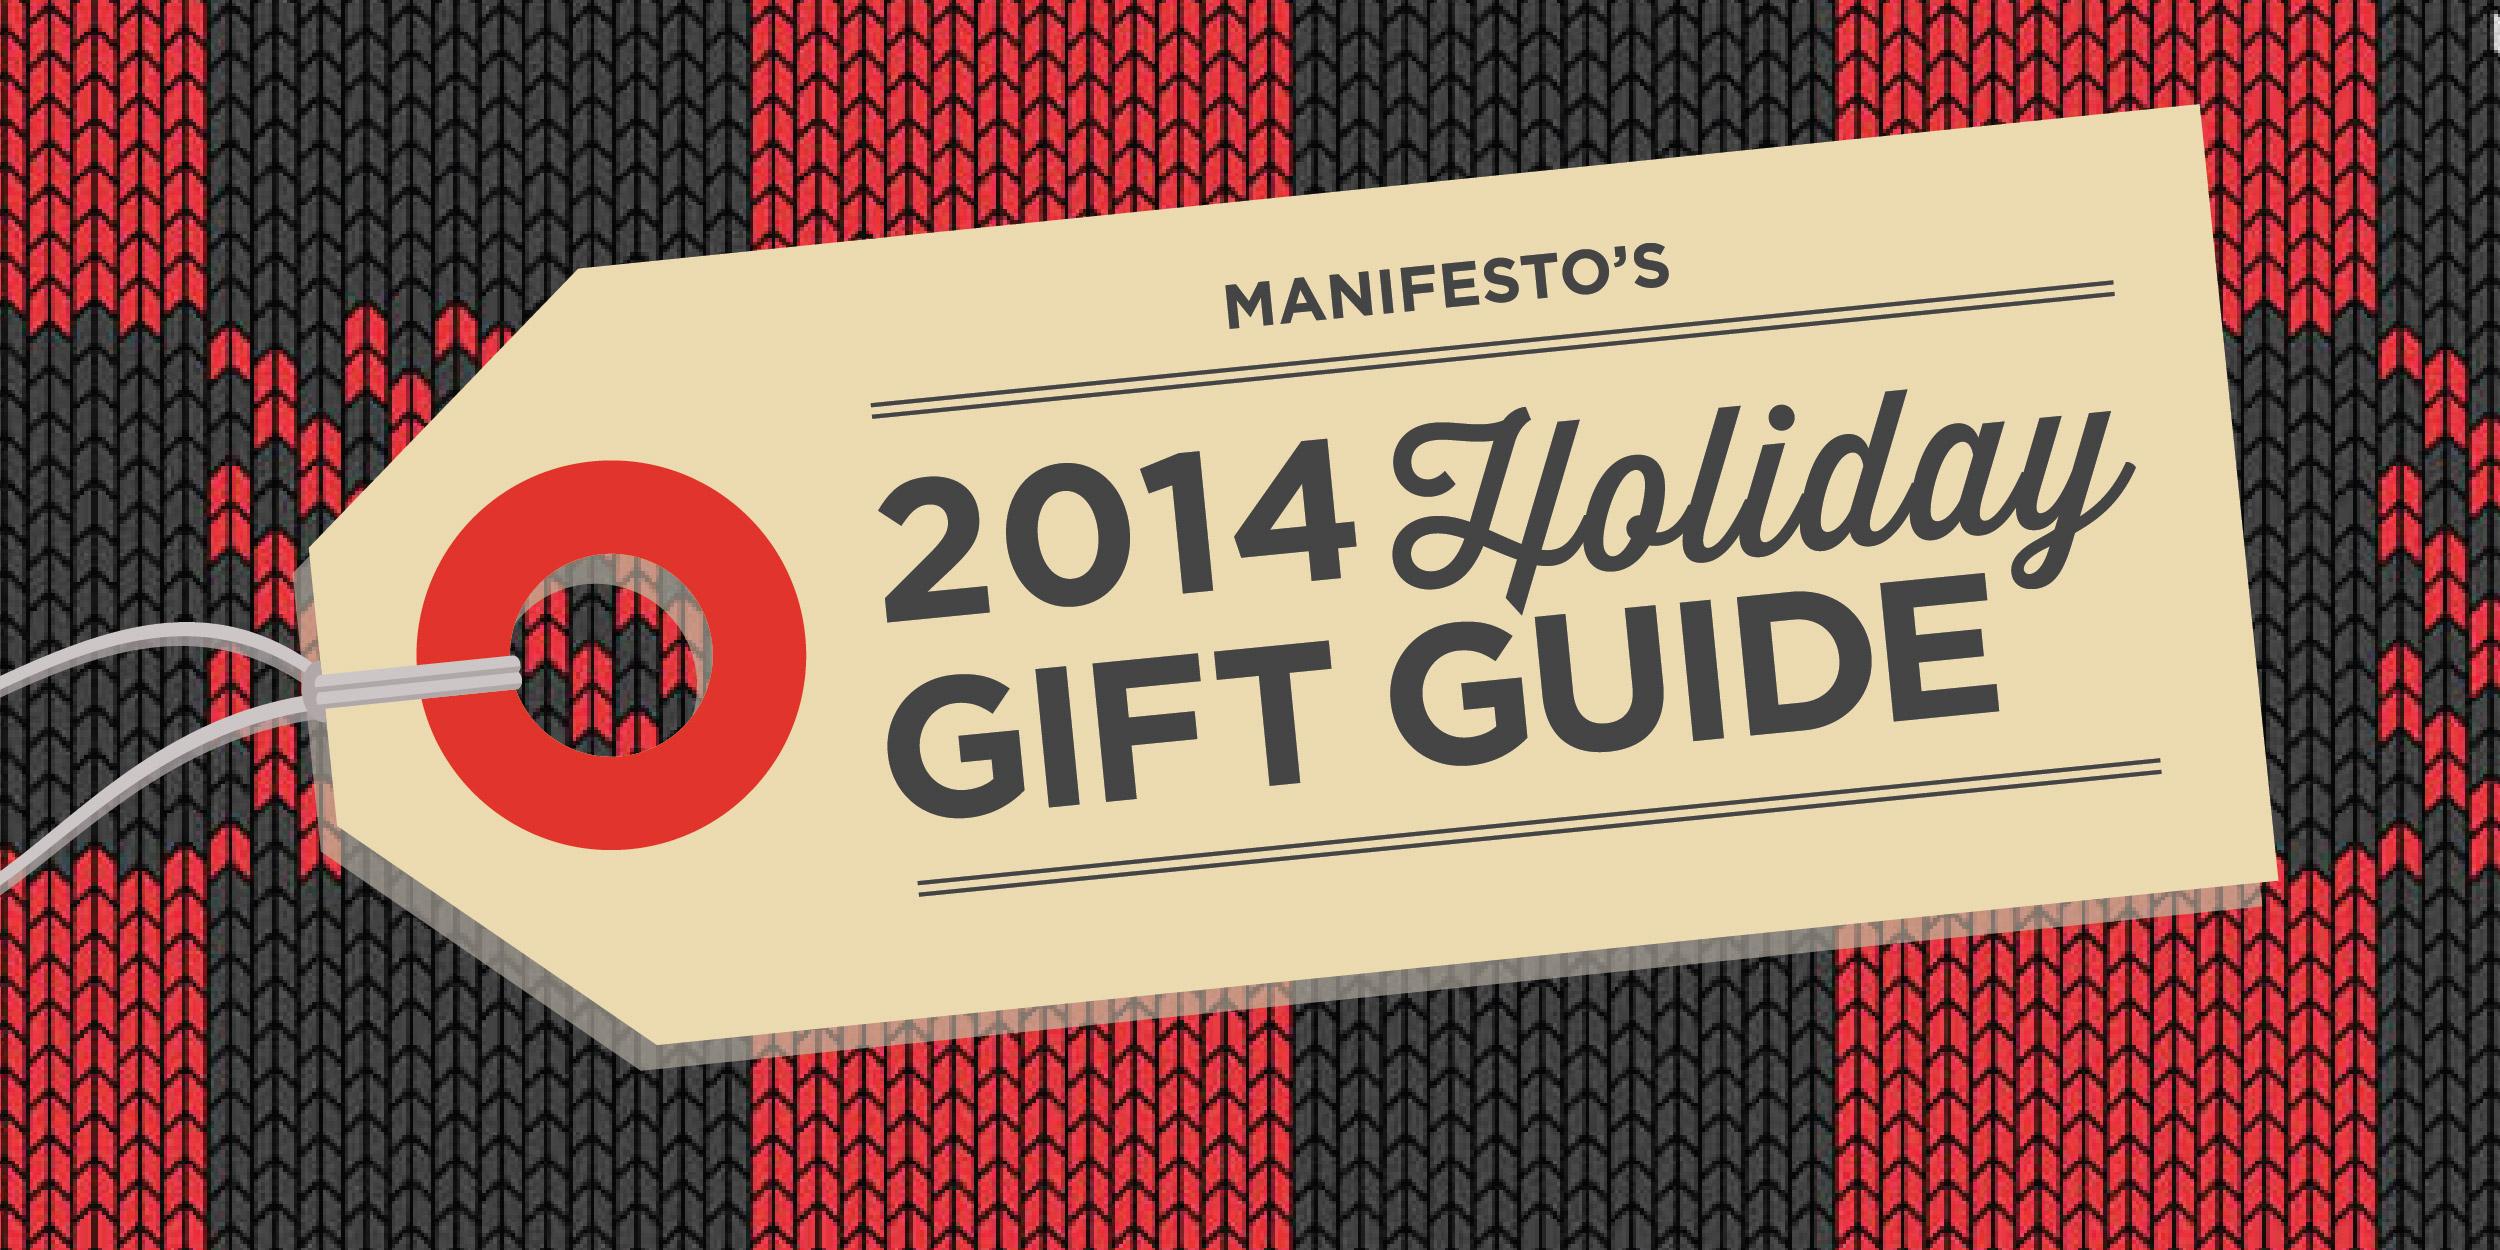 GiftGuideHeader2014_3-01